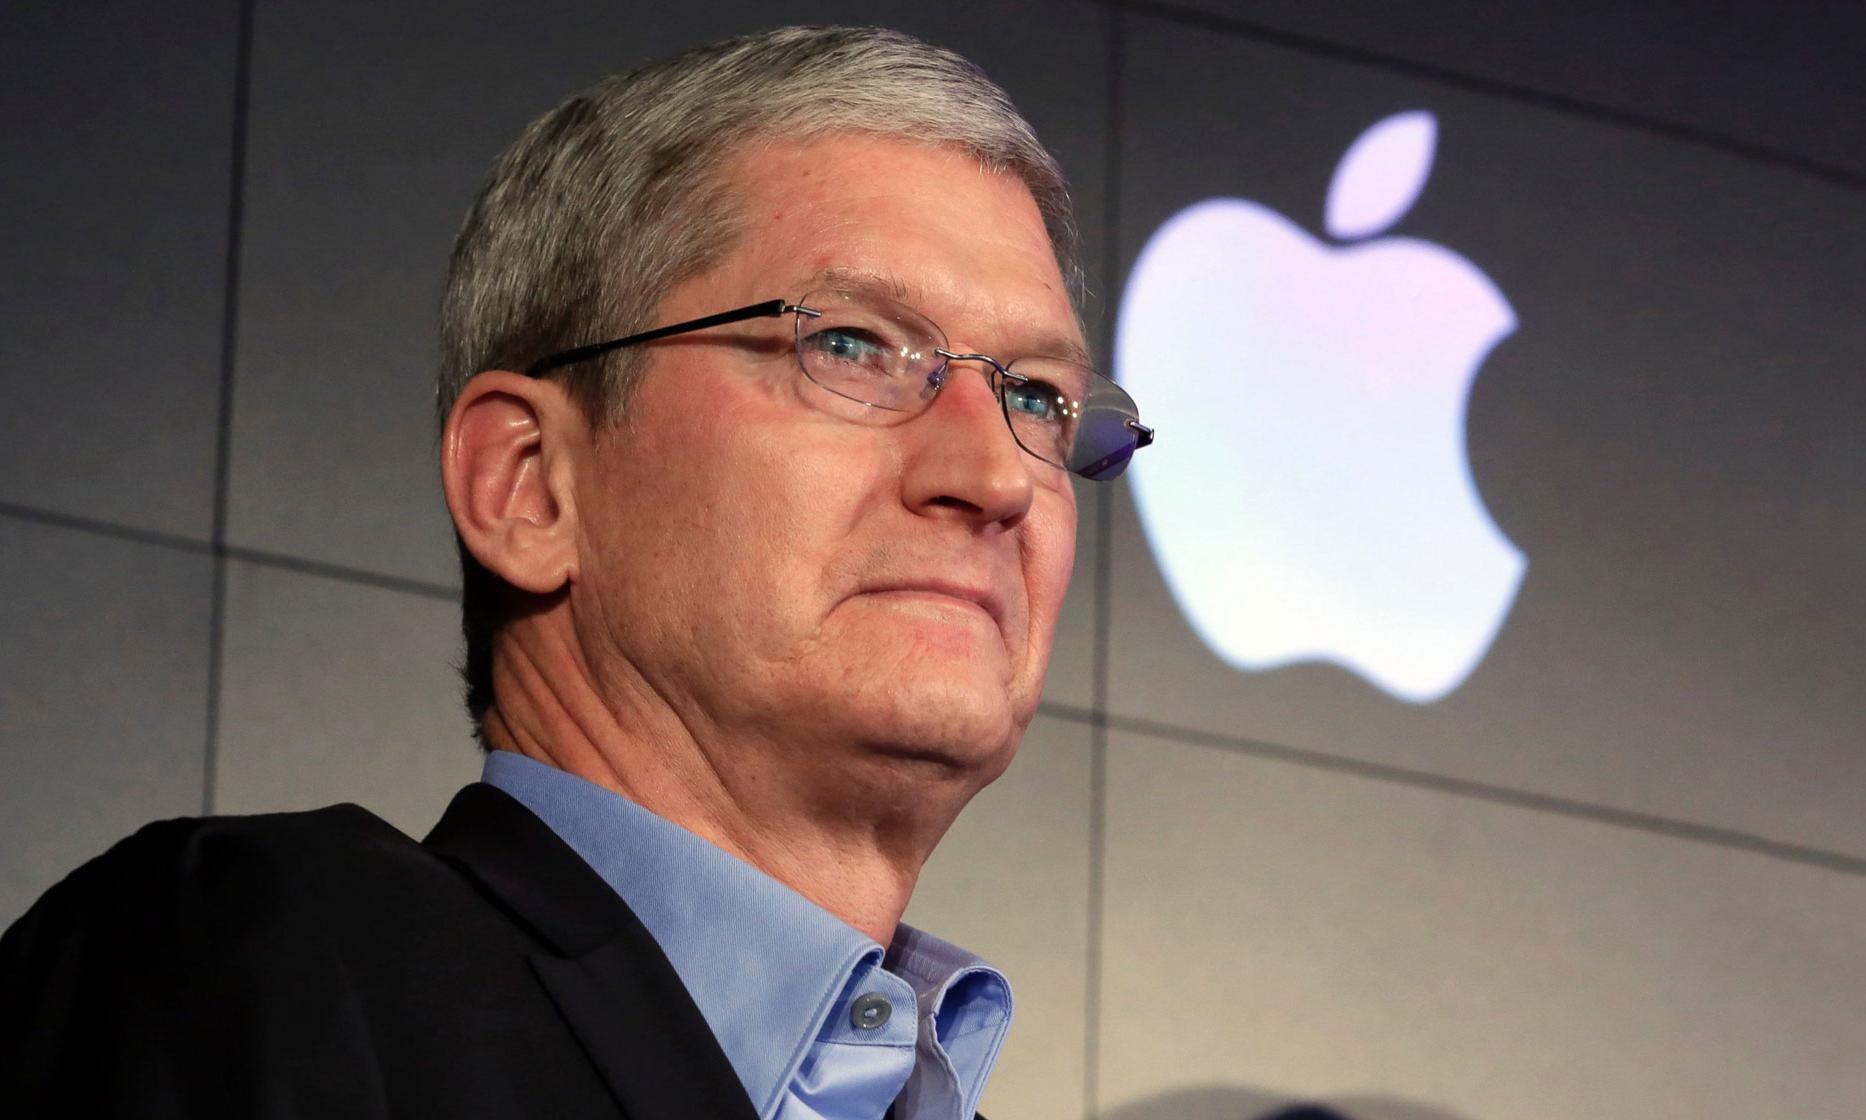 Apple 也加入巴黎圣母院的维修阵营